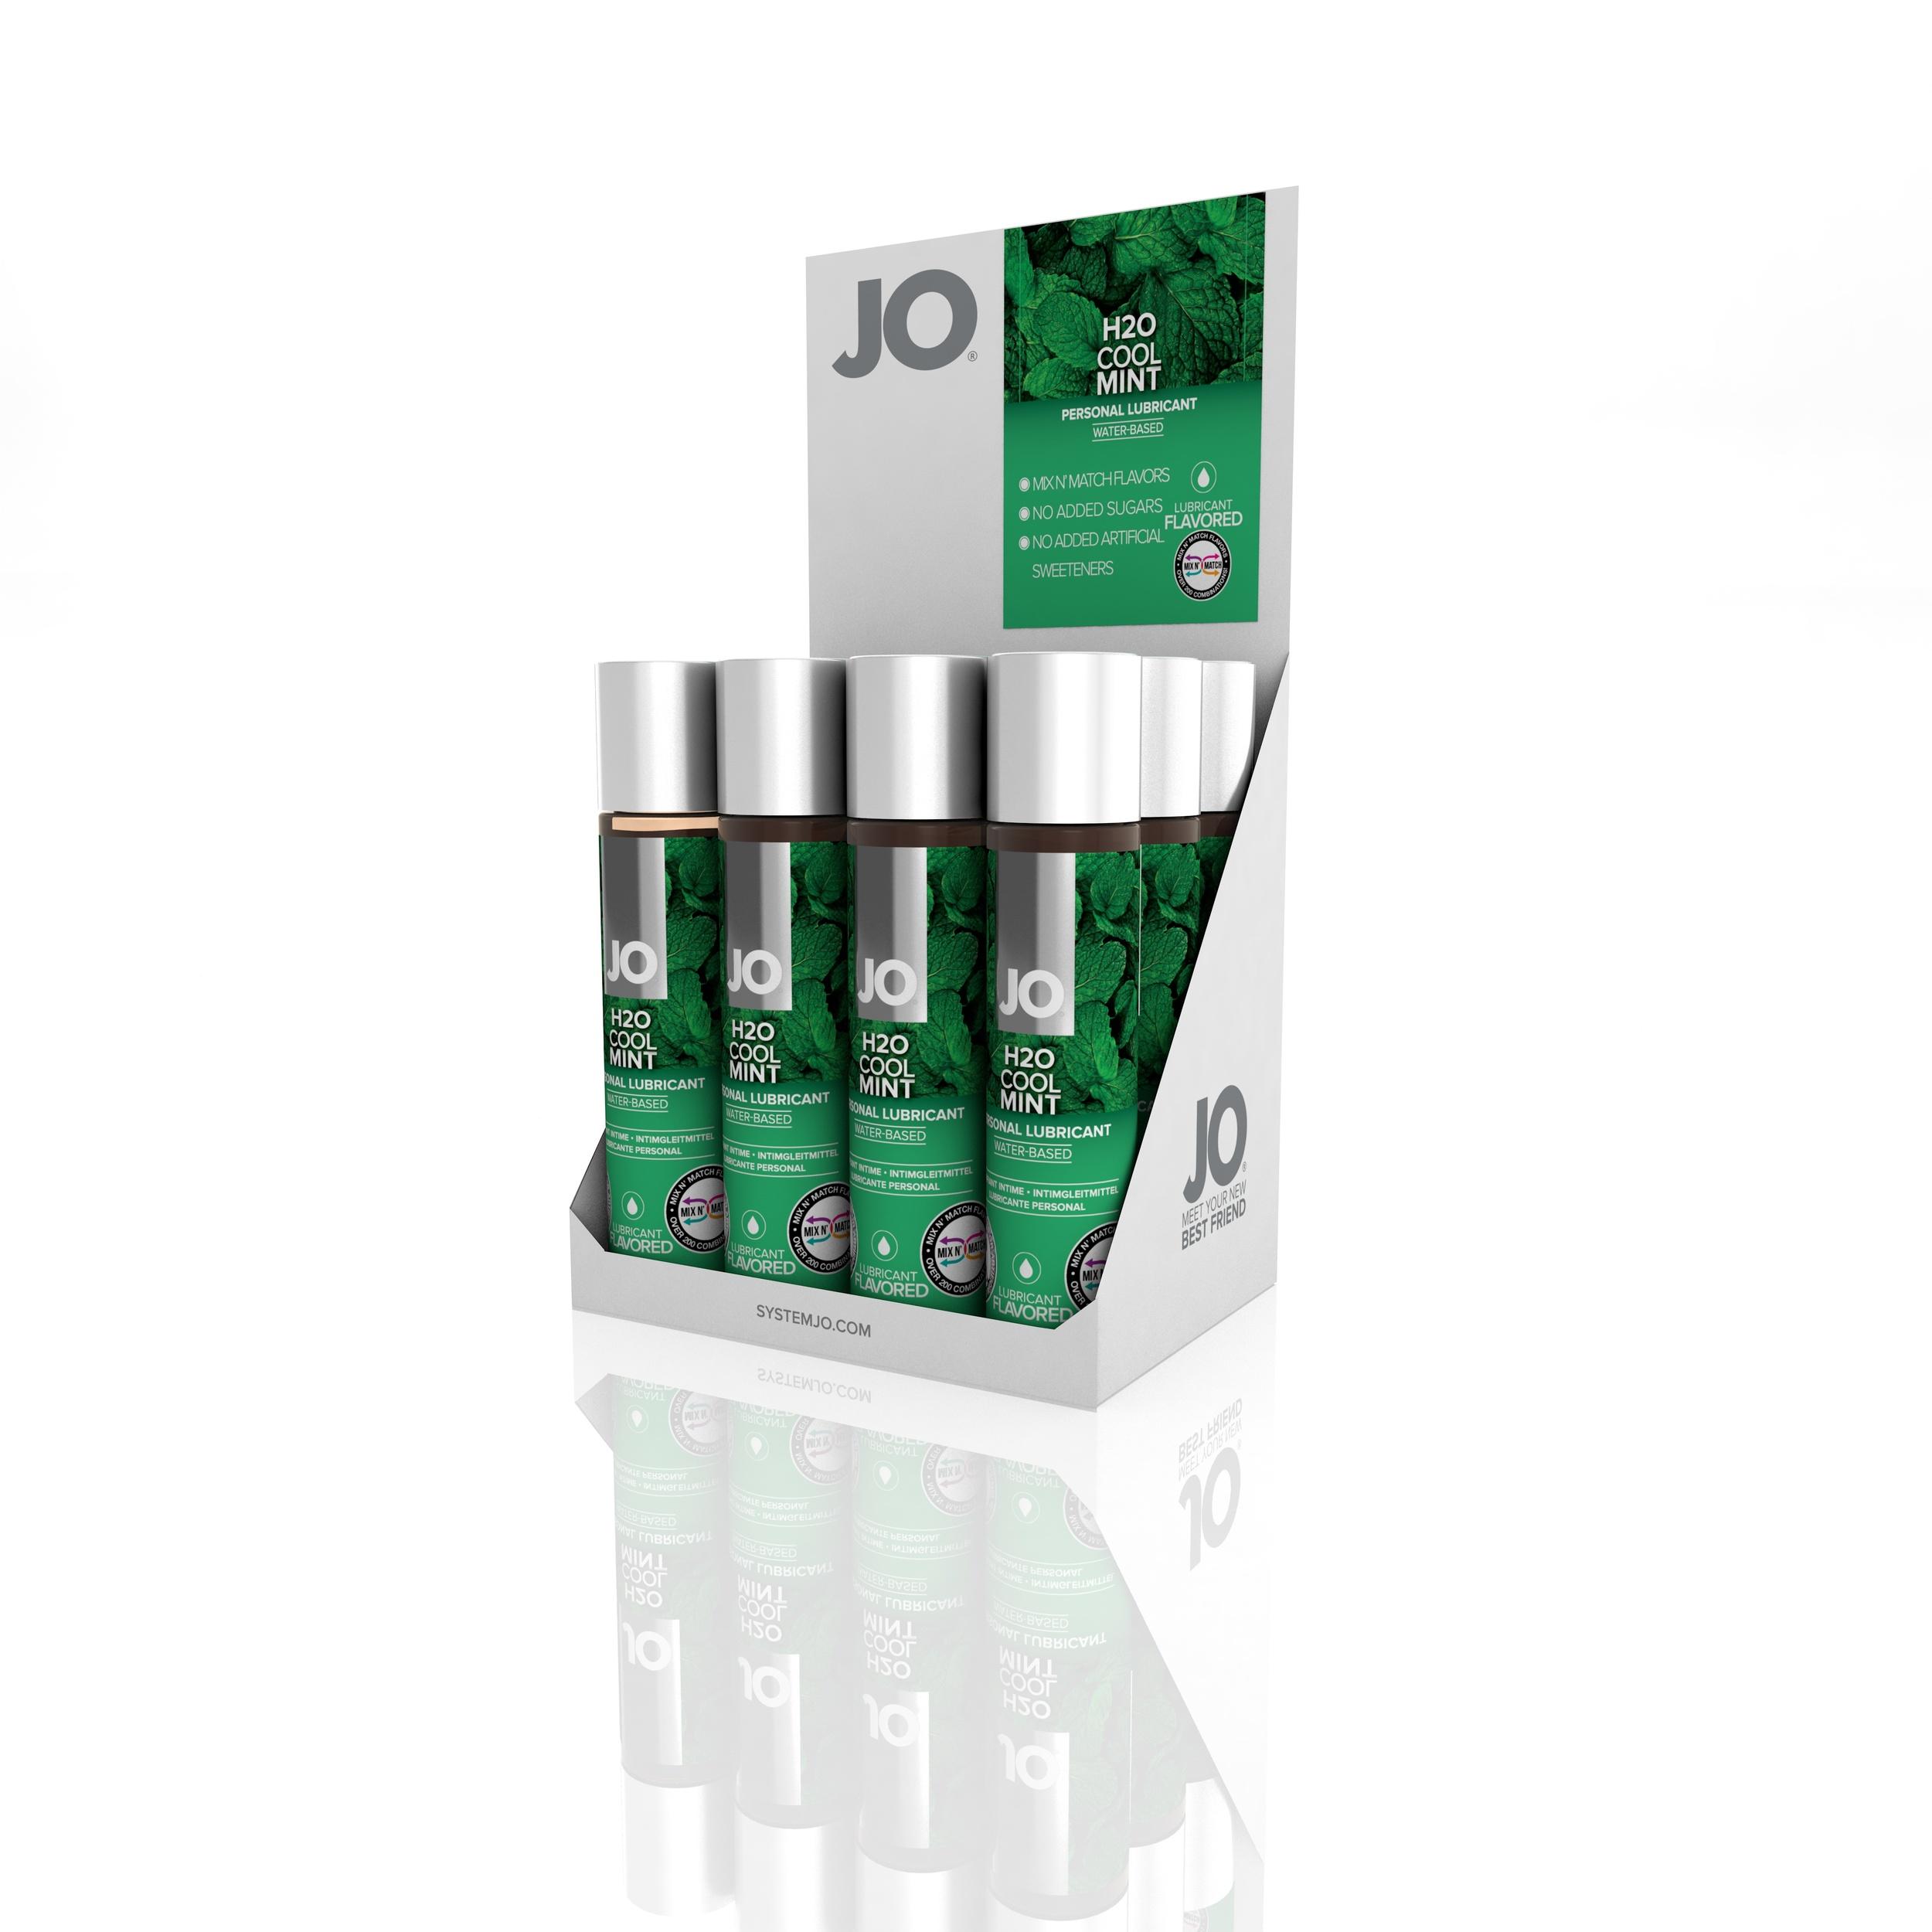 10383 - JO H2O FLAVORED LUBRICANT - COOL MINT - 1fl.oz 30mL (MOQ 12 units - Includes Counter Display).jpg